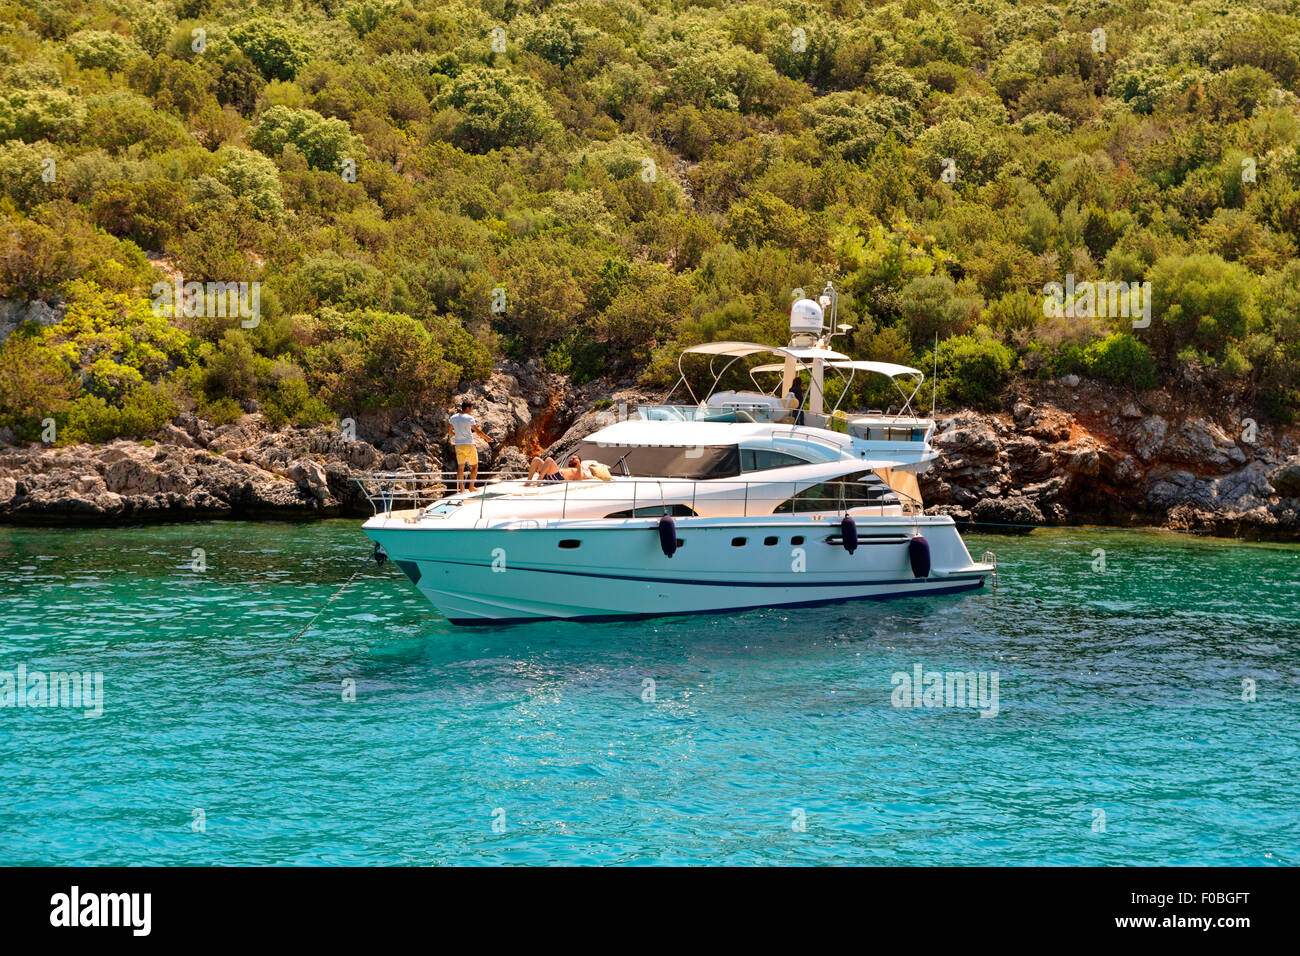 Small motor cruiser anchored in the Mediterranean. Stock Photo